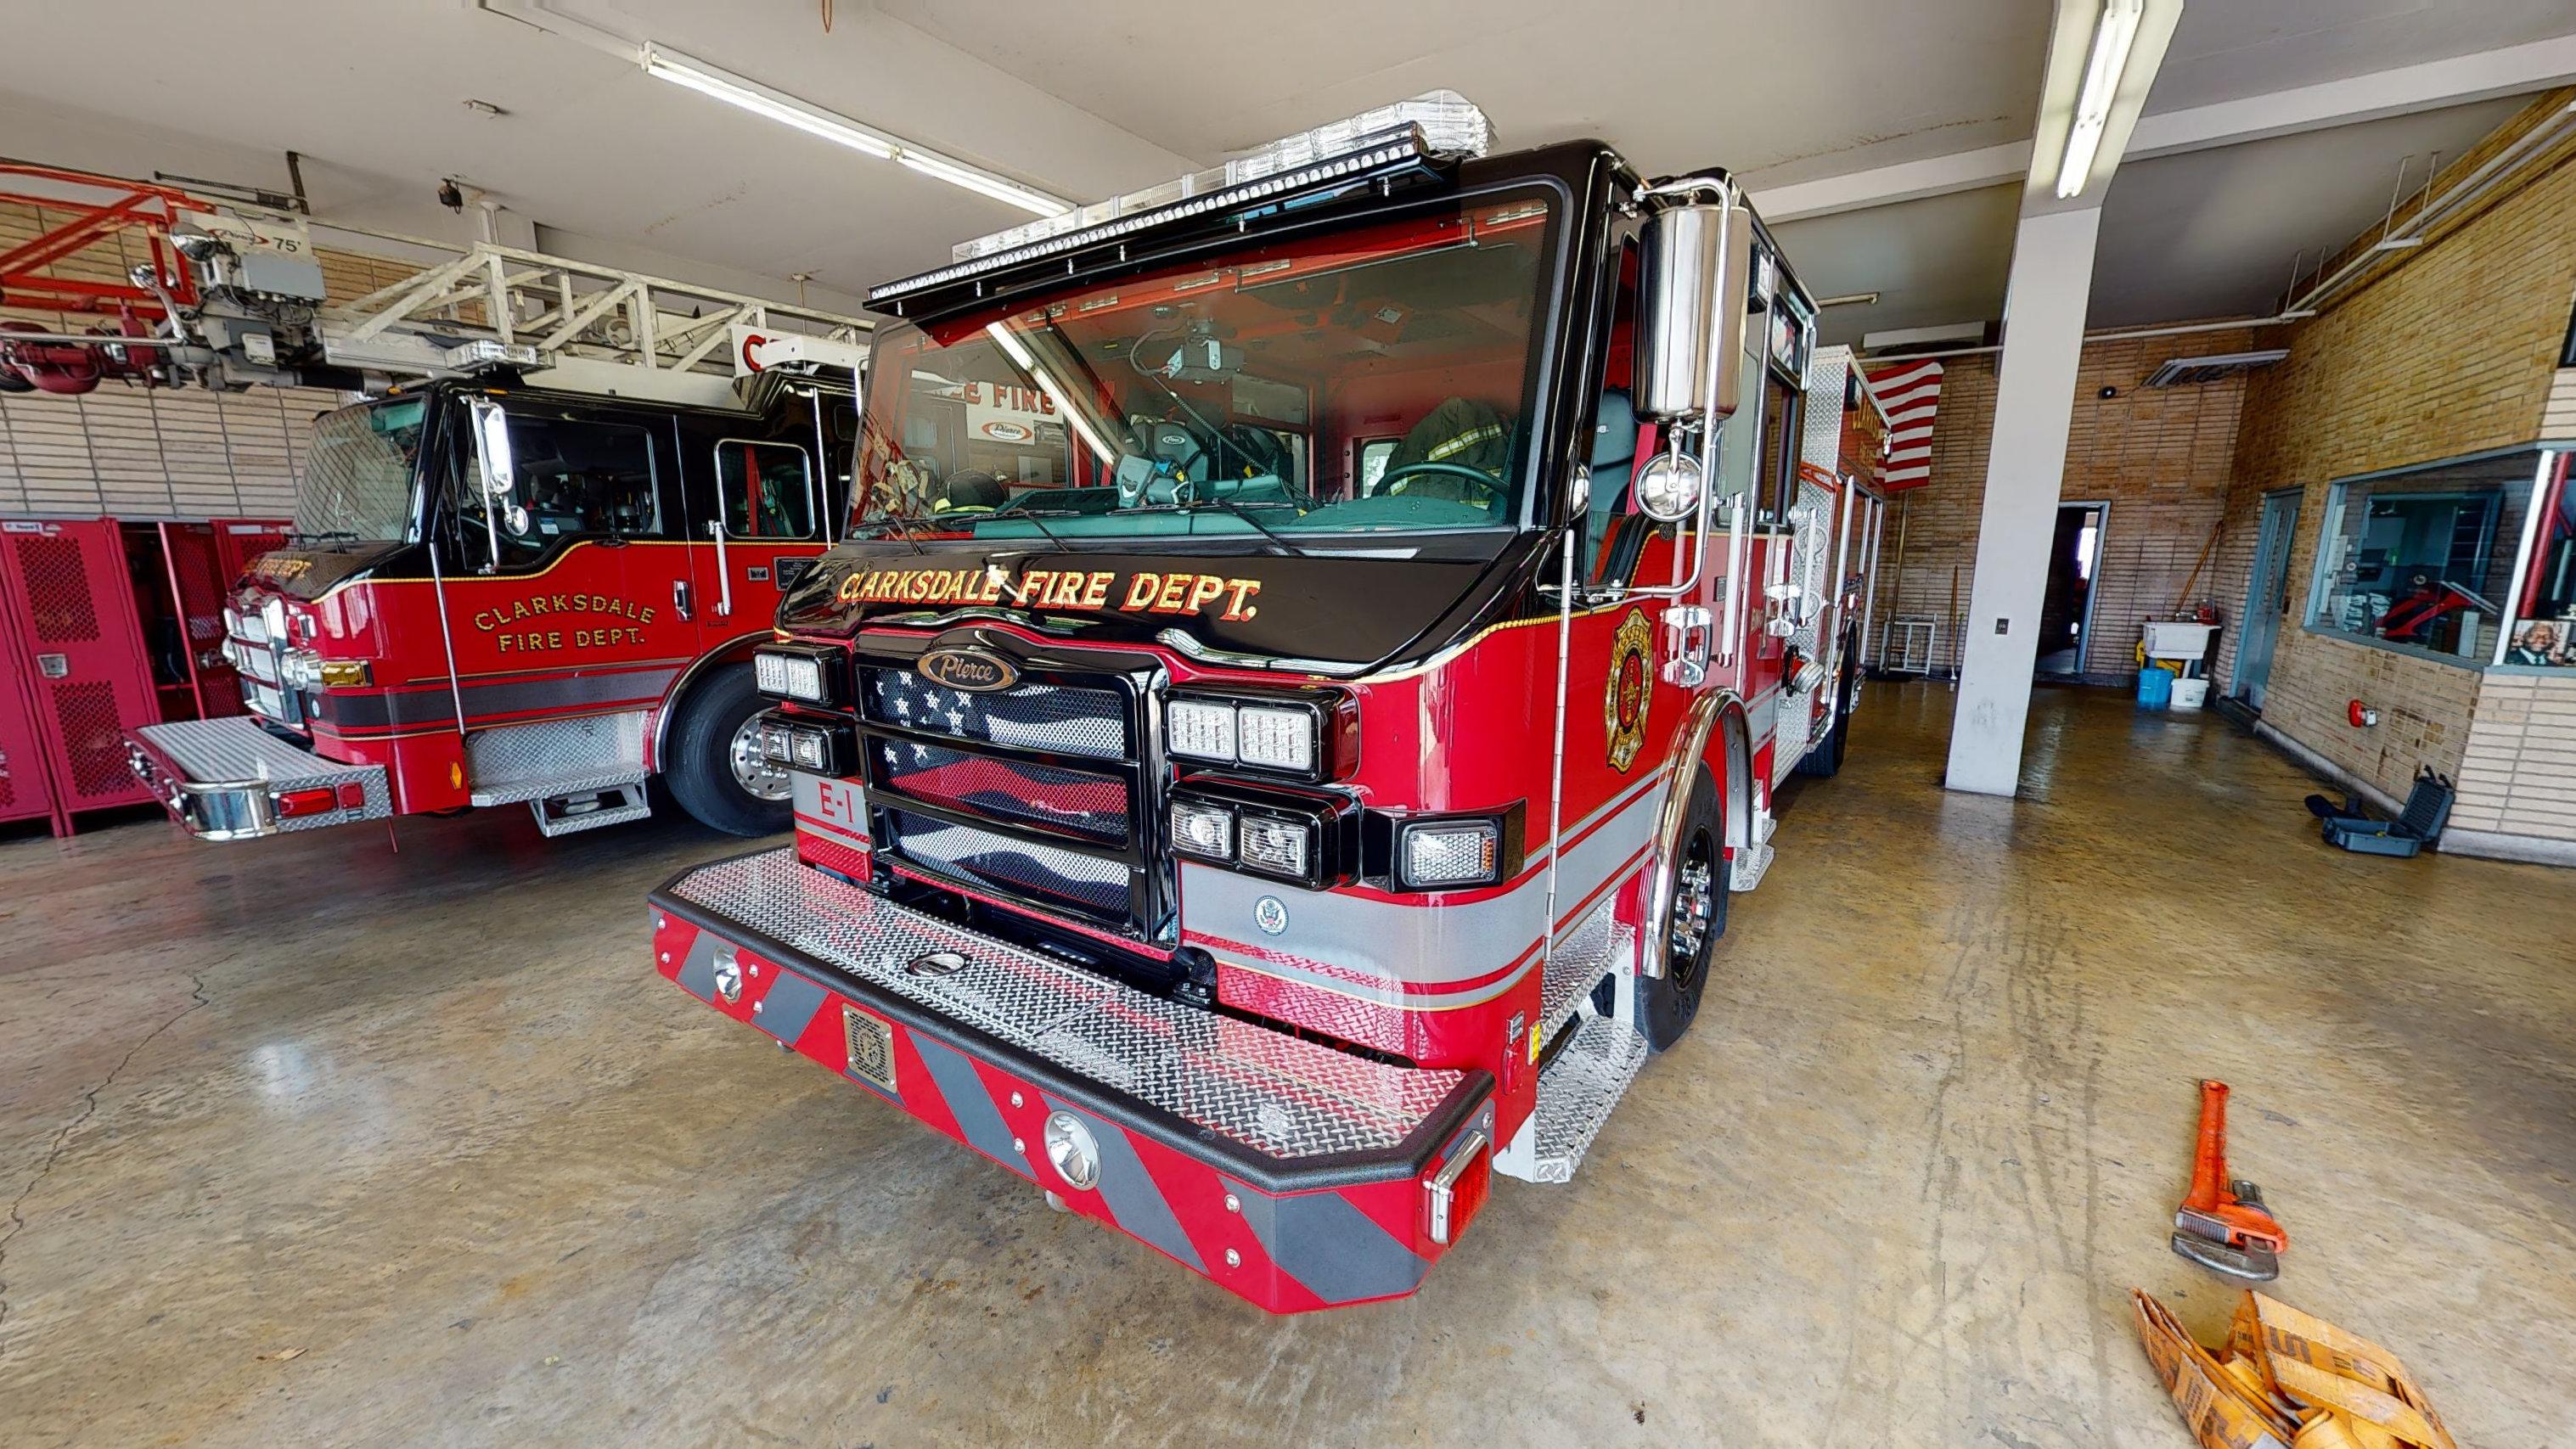 2_Clarksdale-Fire-Dept-06072021_112119